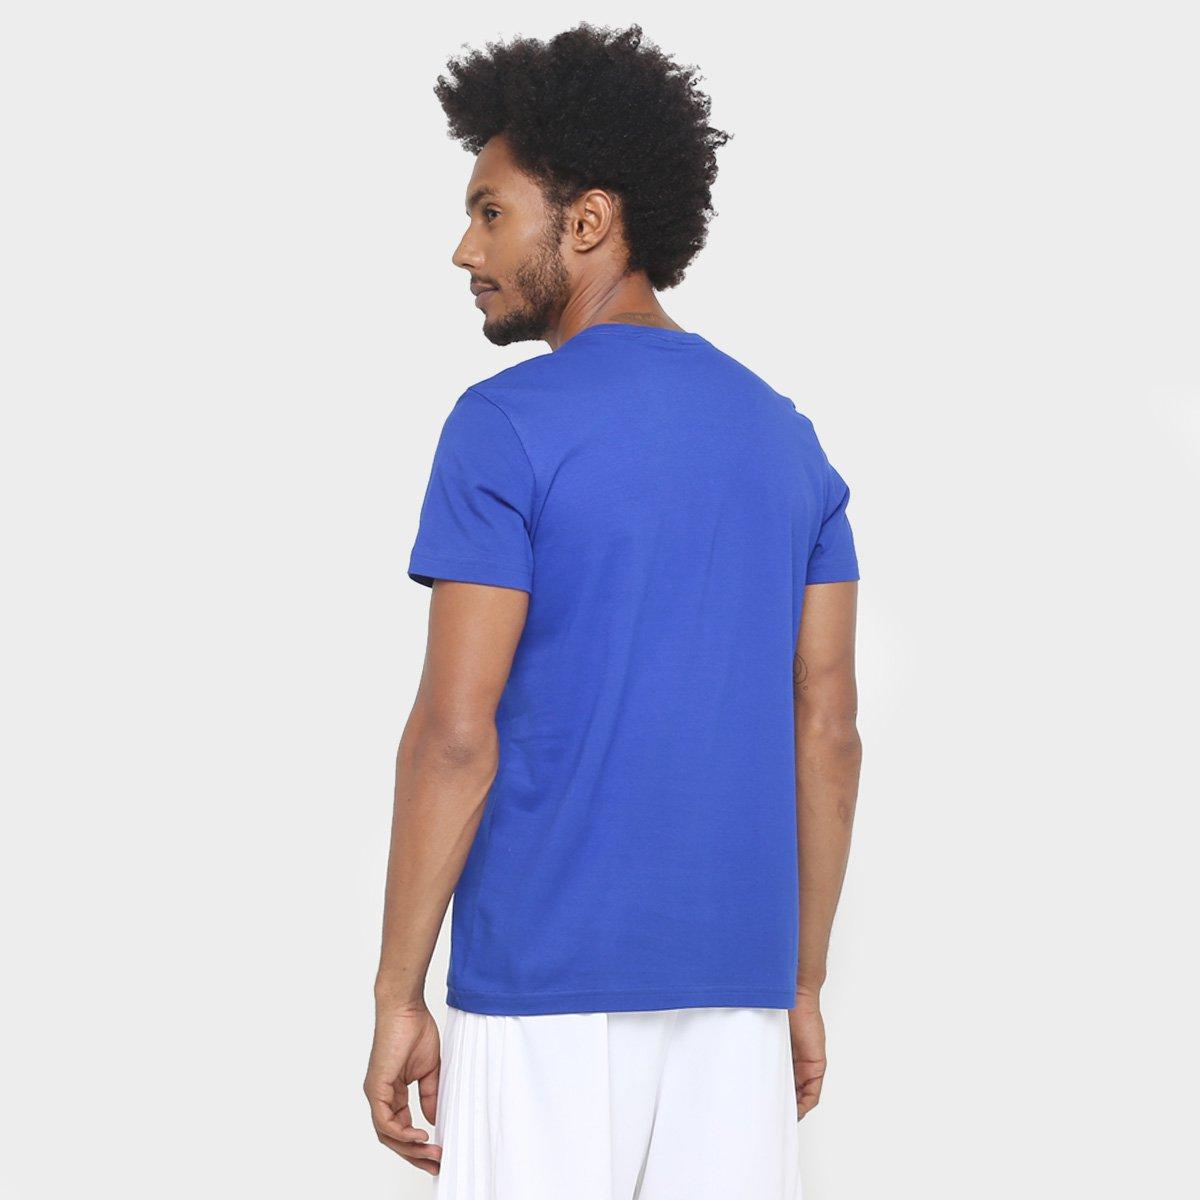 Camiseta Adidas Badge Of Sports Masculina - Compre Agora  cc4b7adaf7f